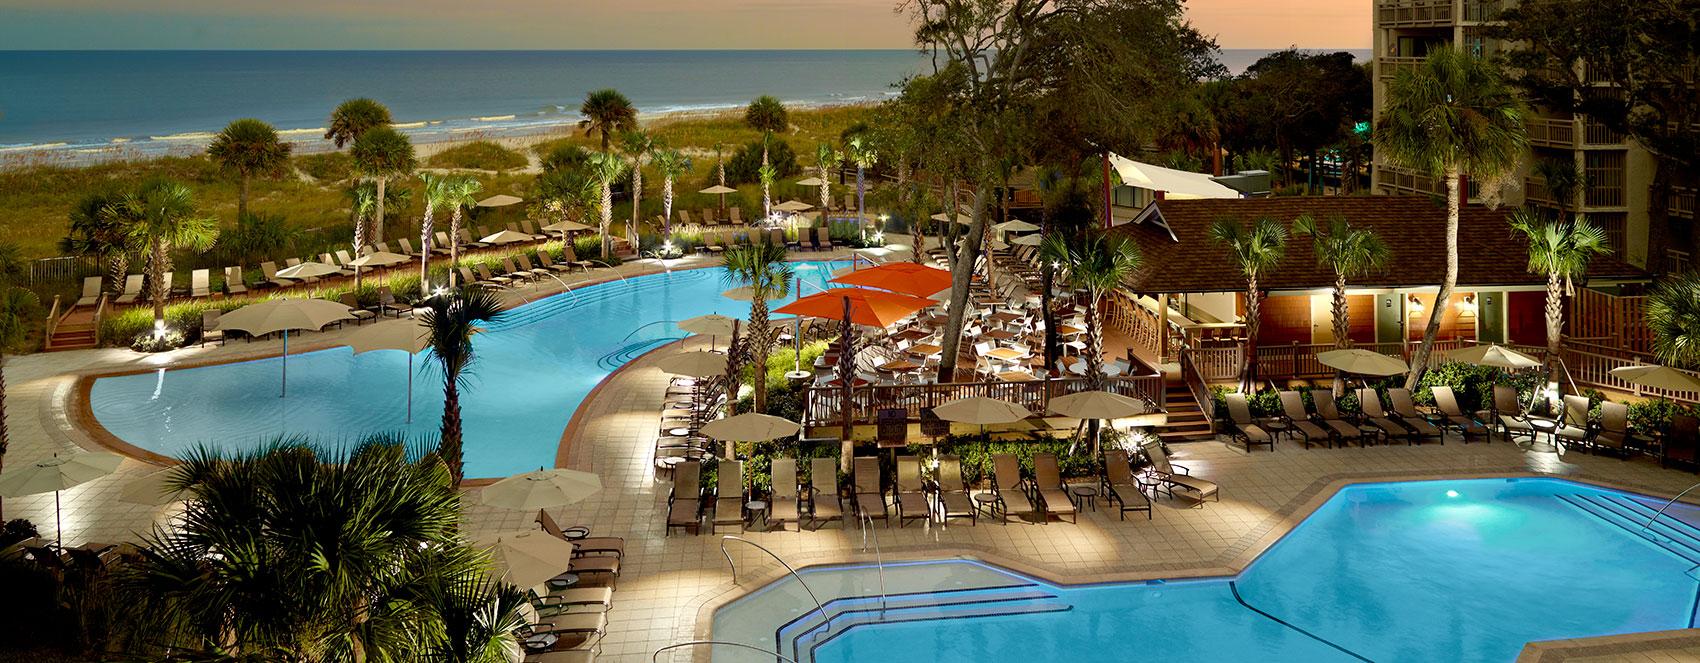 Hilton Head Hotel Omni Hilton Head Oceanfront Resort